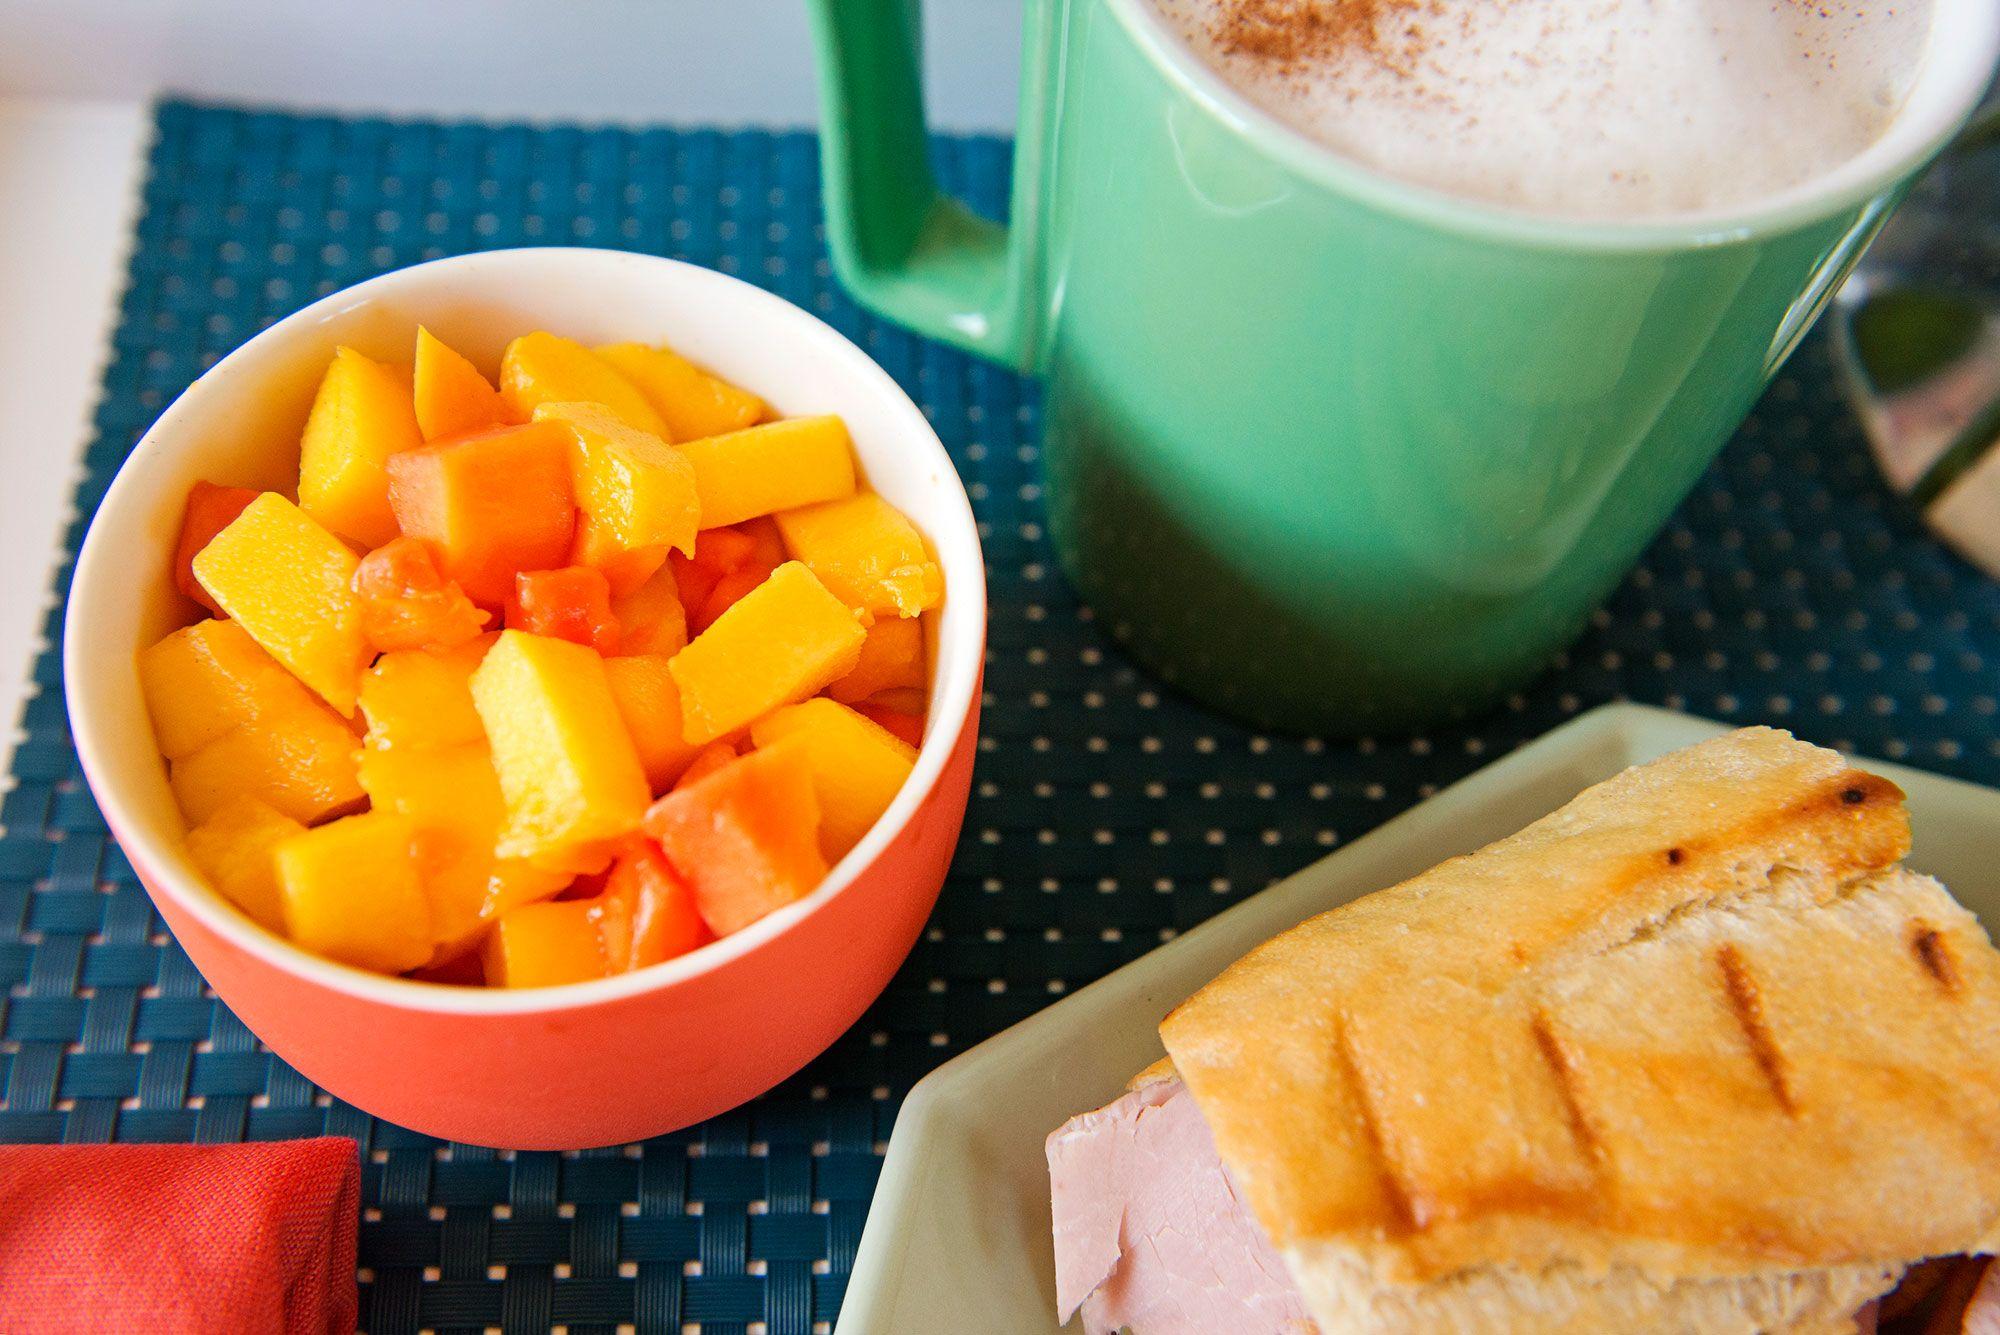 Fried egg cubano with papaya-mango salad and café con leche.